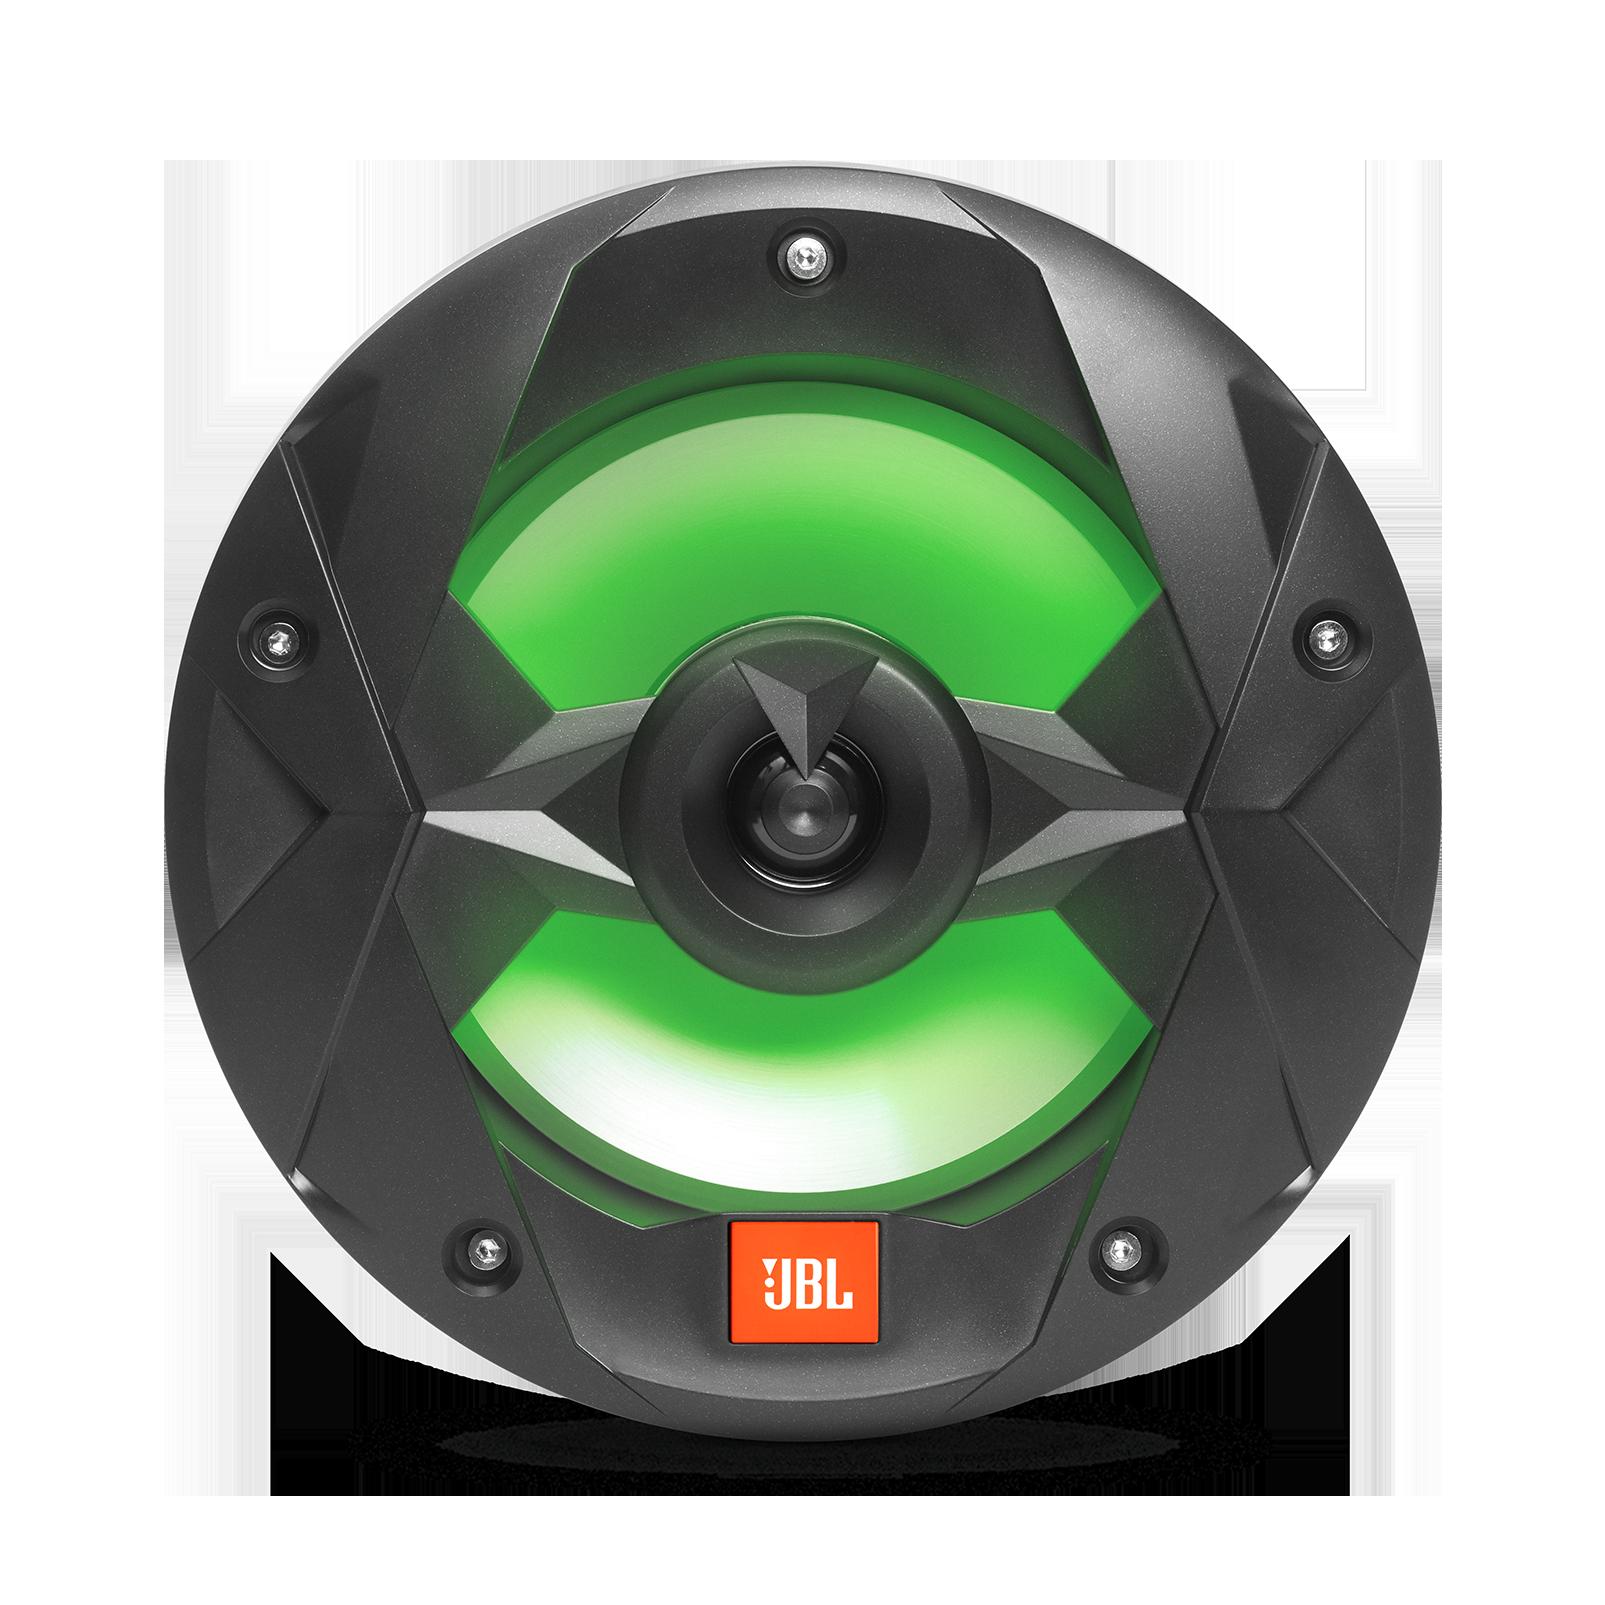 "Club Marine MS8LB - Black Matte - Club Marine MS8LB—8"" (200mm) two-way marine audio multi-element speaker with RGB lighting – Black - Detailshot 2"